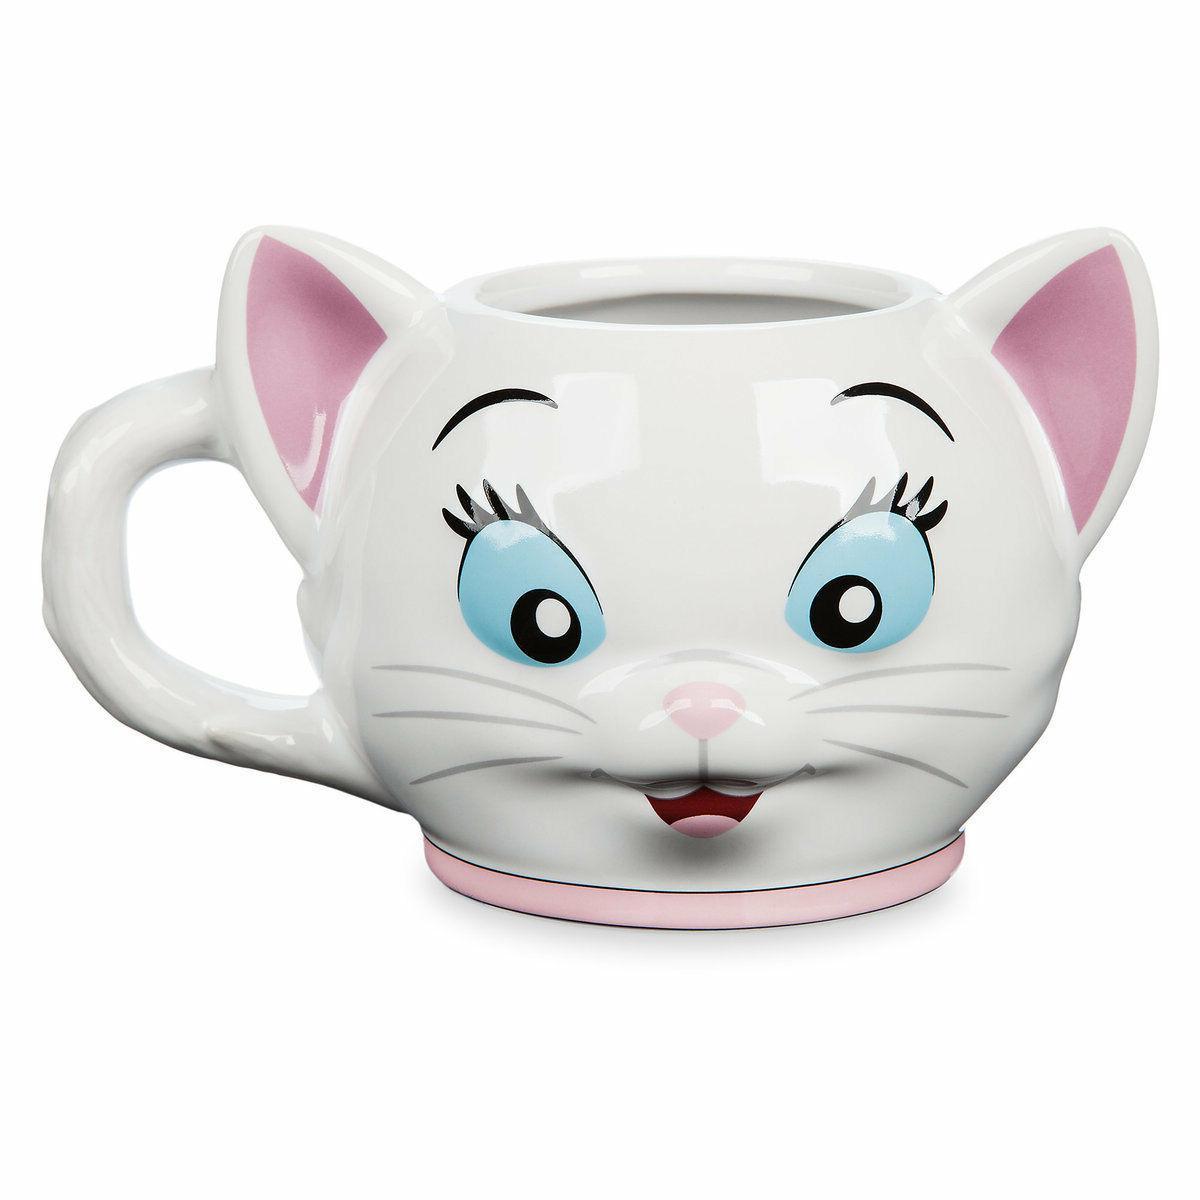 marie figural 12 oz coffee tea mug